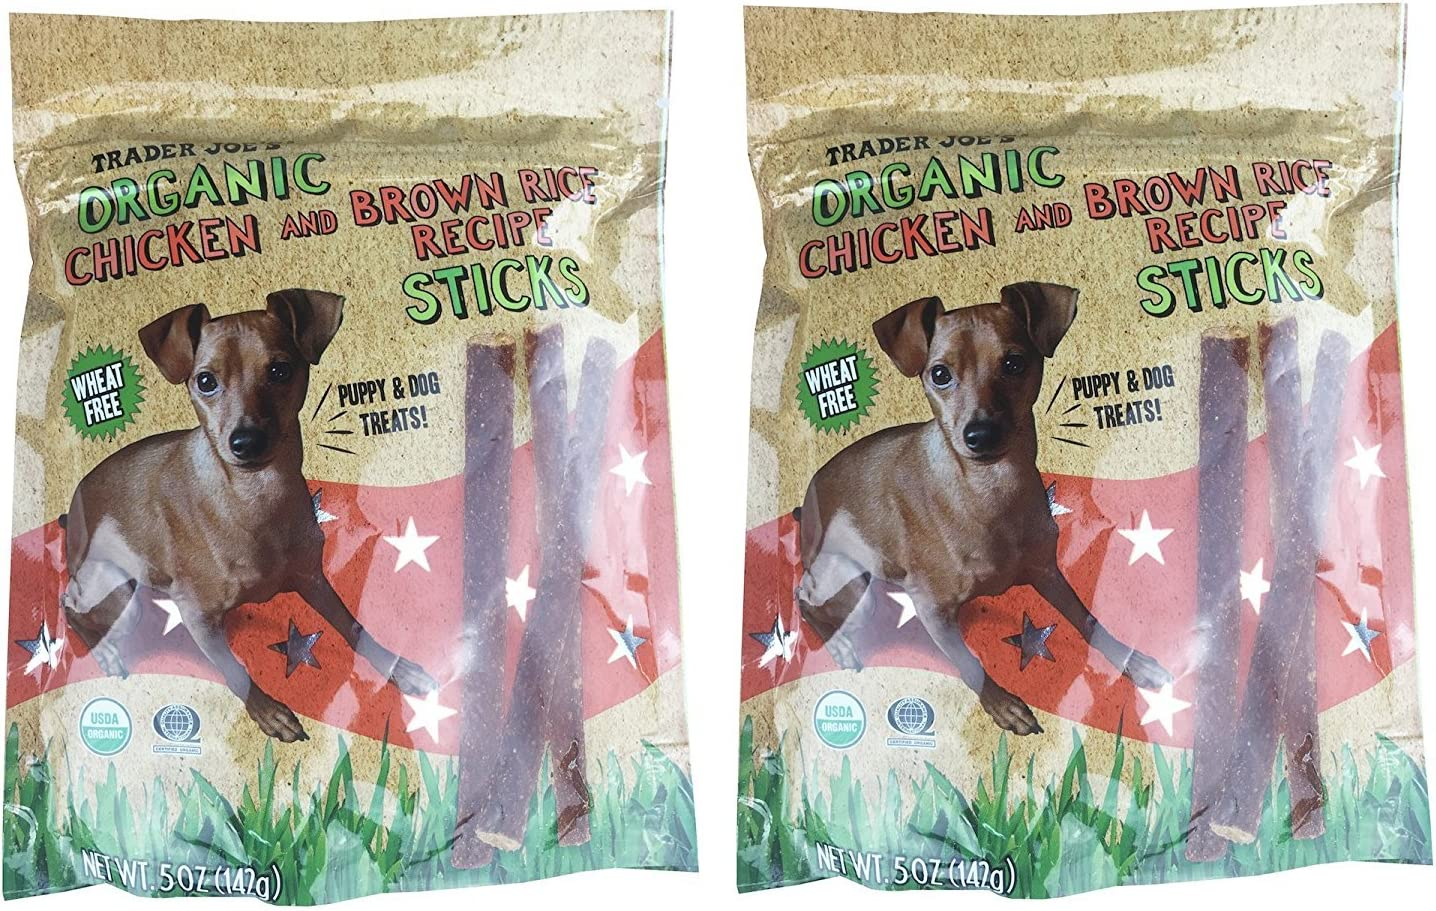 2 Pkgs. Trader Joe's Organic Chicken & Brown Rice Sticks Wheat Free....5 Oz Bag X 2